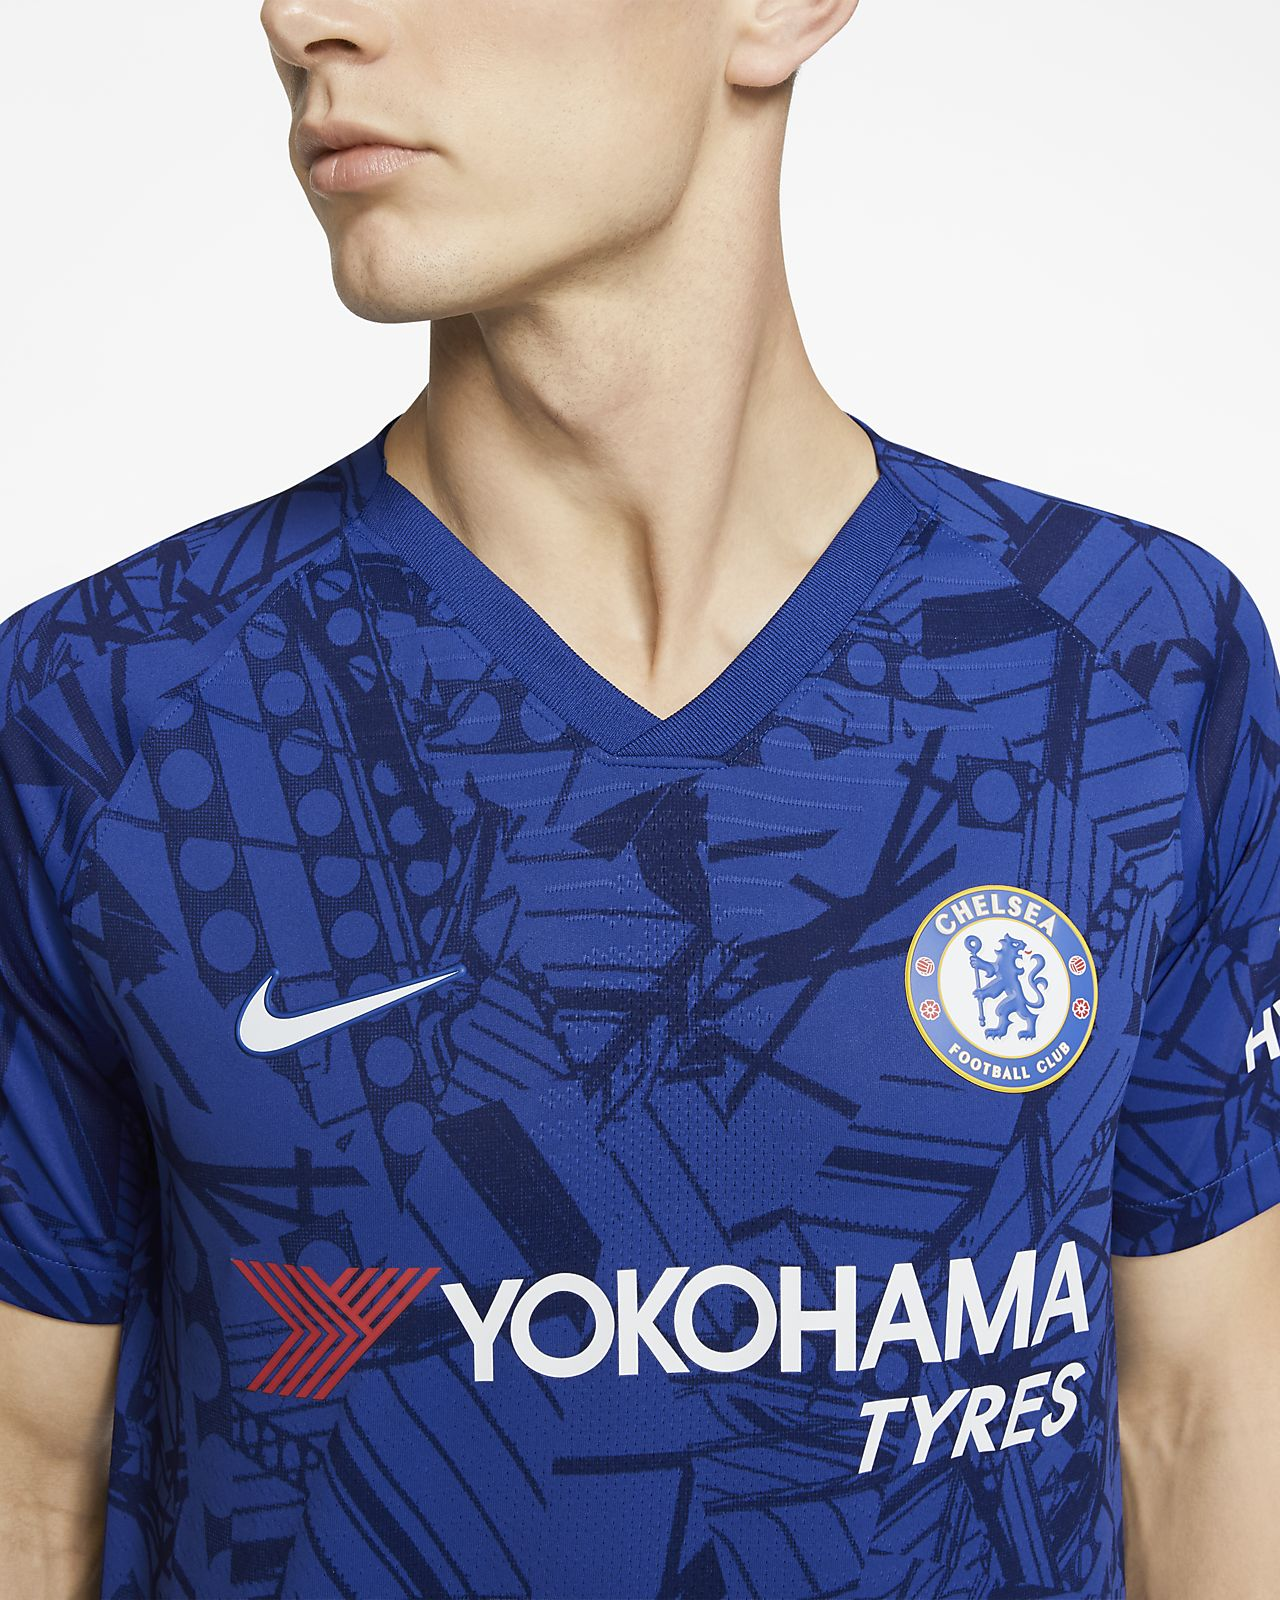 Chelsea FC 2019/20 Vapor Match Home Men